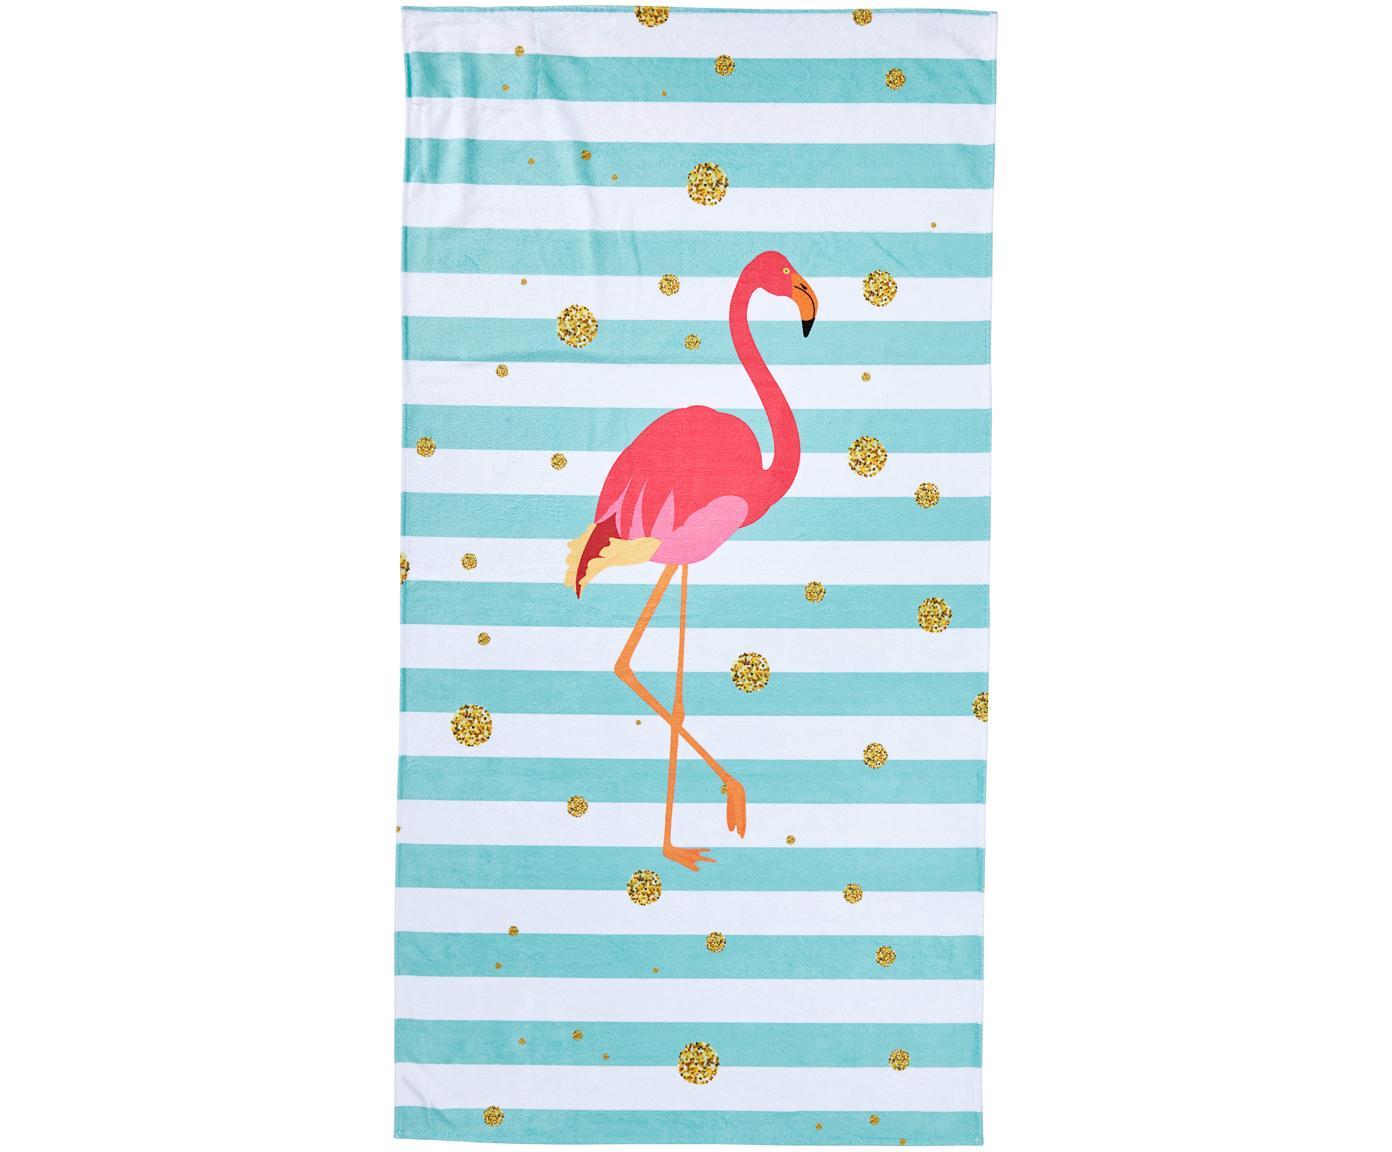 Strandlaken Case Flamingo, Onderzijde: badstof, Blauw, wit, roze, goudkleurig, 90 x 180 cm